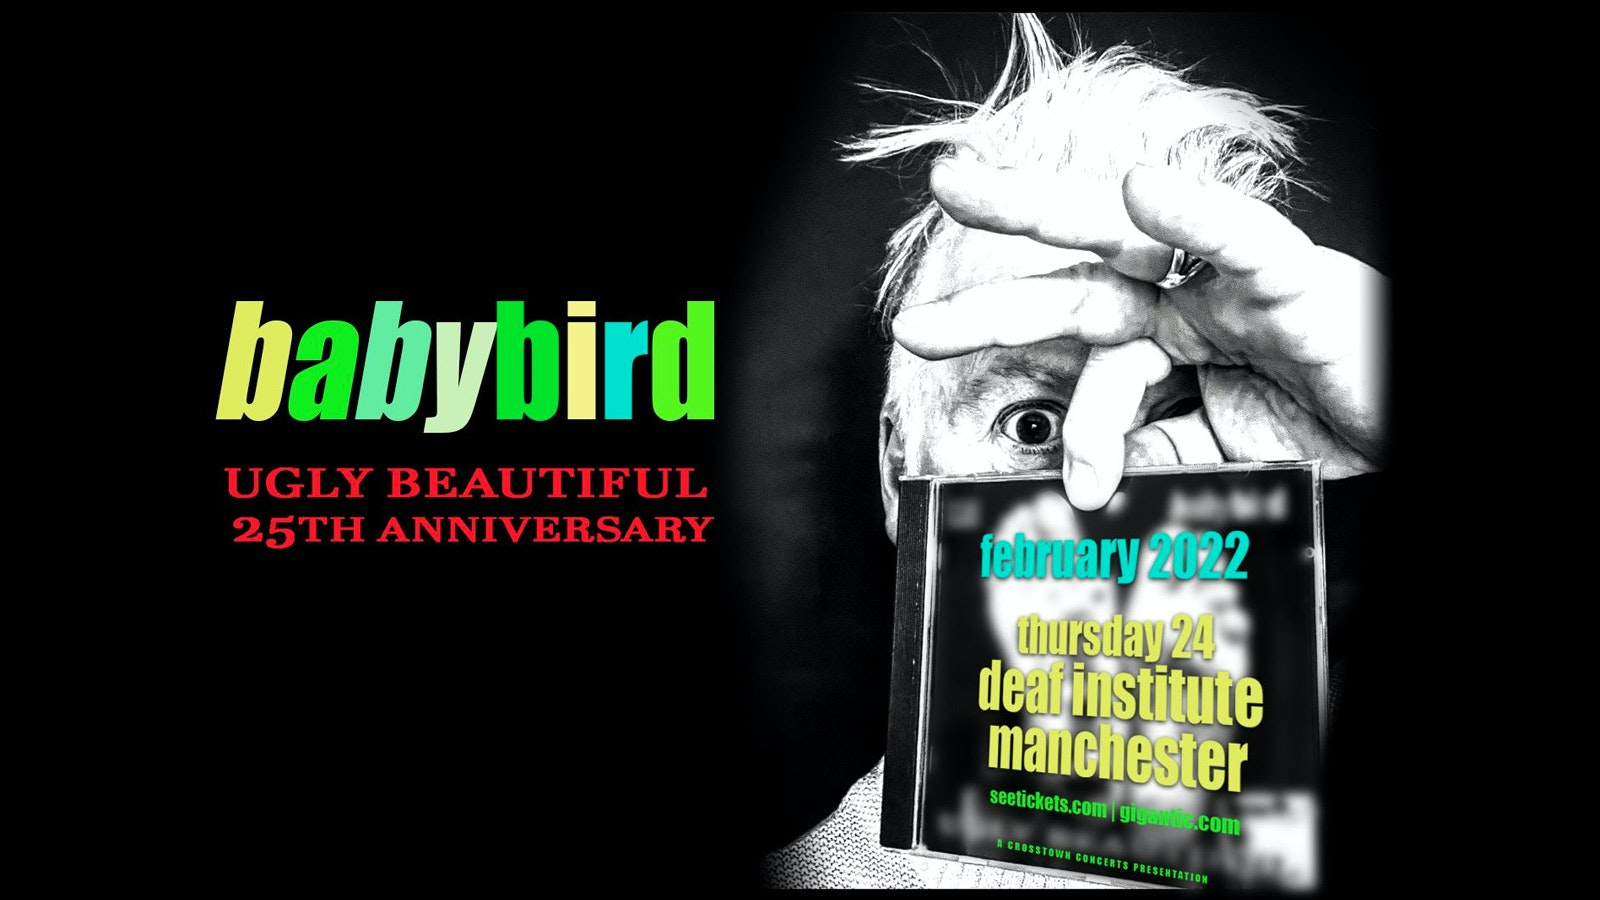 Babybird – Ugly Beautiful 25TH Anniversary